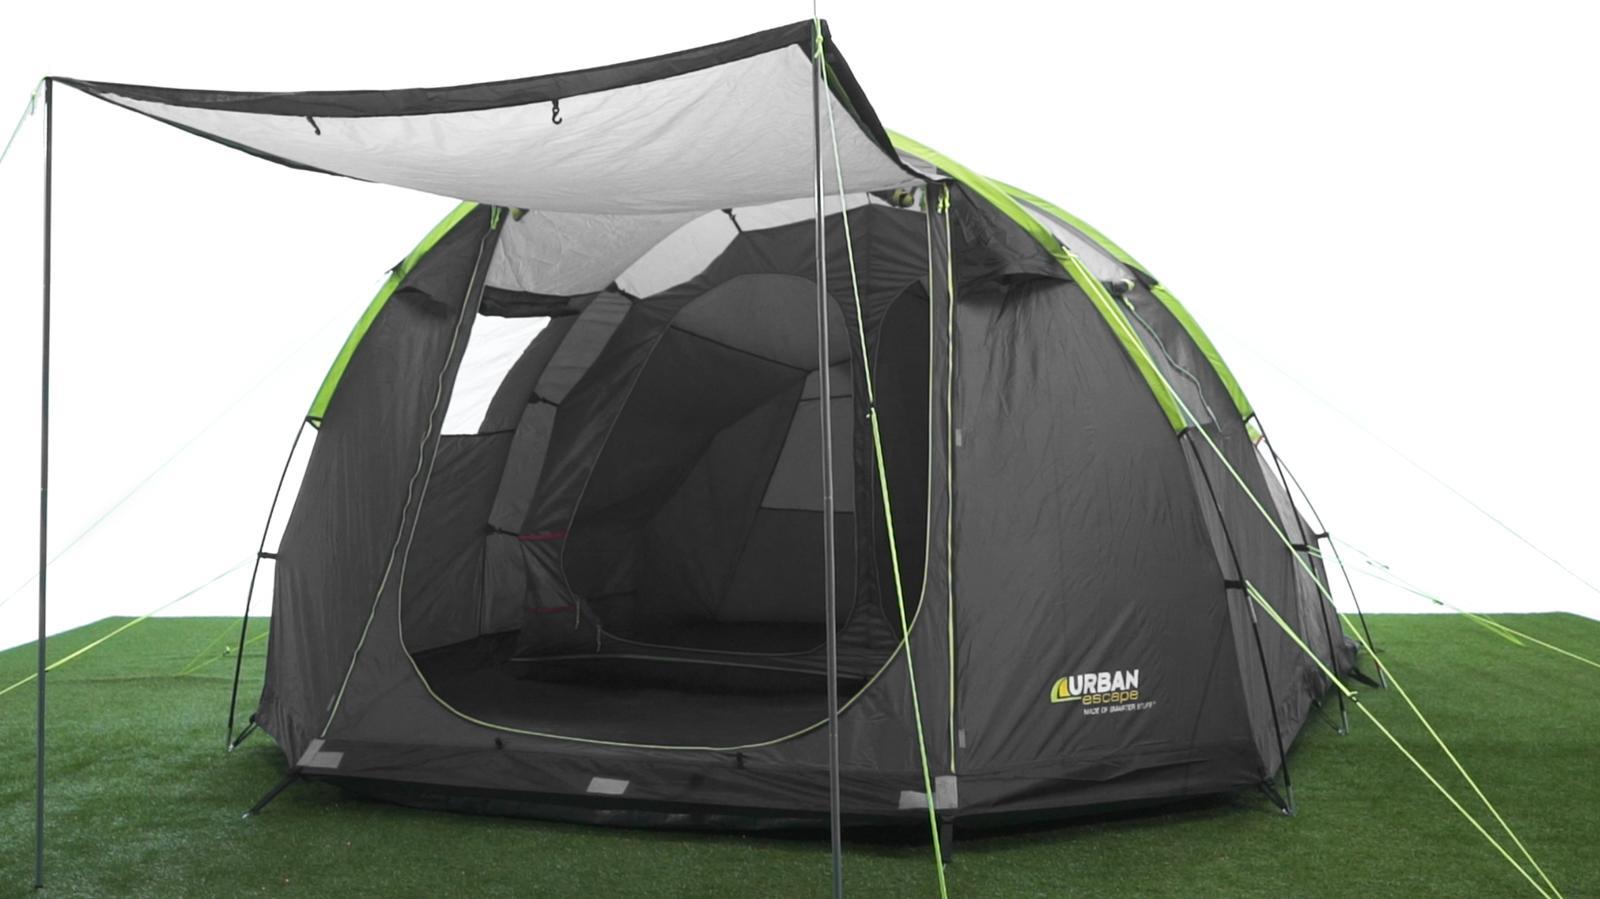 Urban Escape 4 Man Tunnel Tent  sc 1 st  Halfords & Escape 4 Man Tunnel Tent